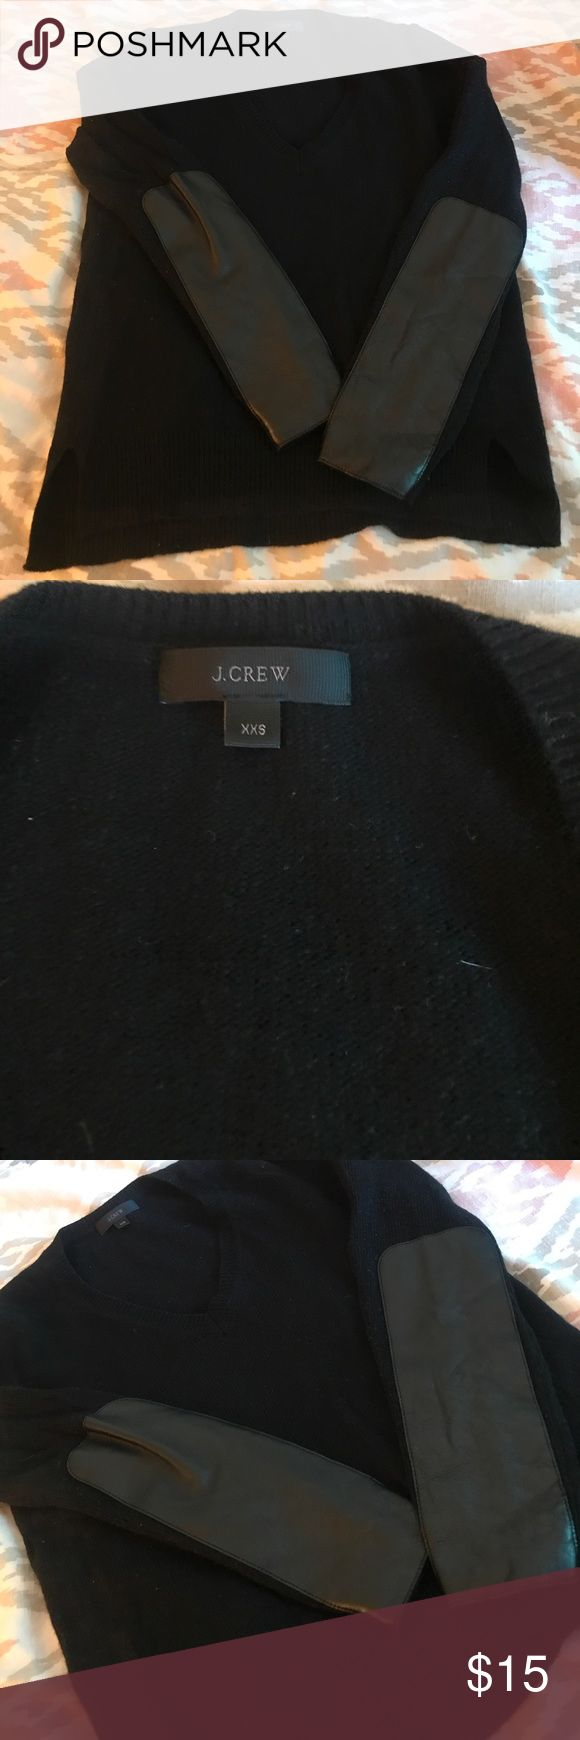 Leather elbow patch sweater J.Crew J.Crew V-Neck sweatshirt with leather elbow patches J. Crew Sweaters V-Necks